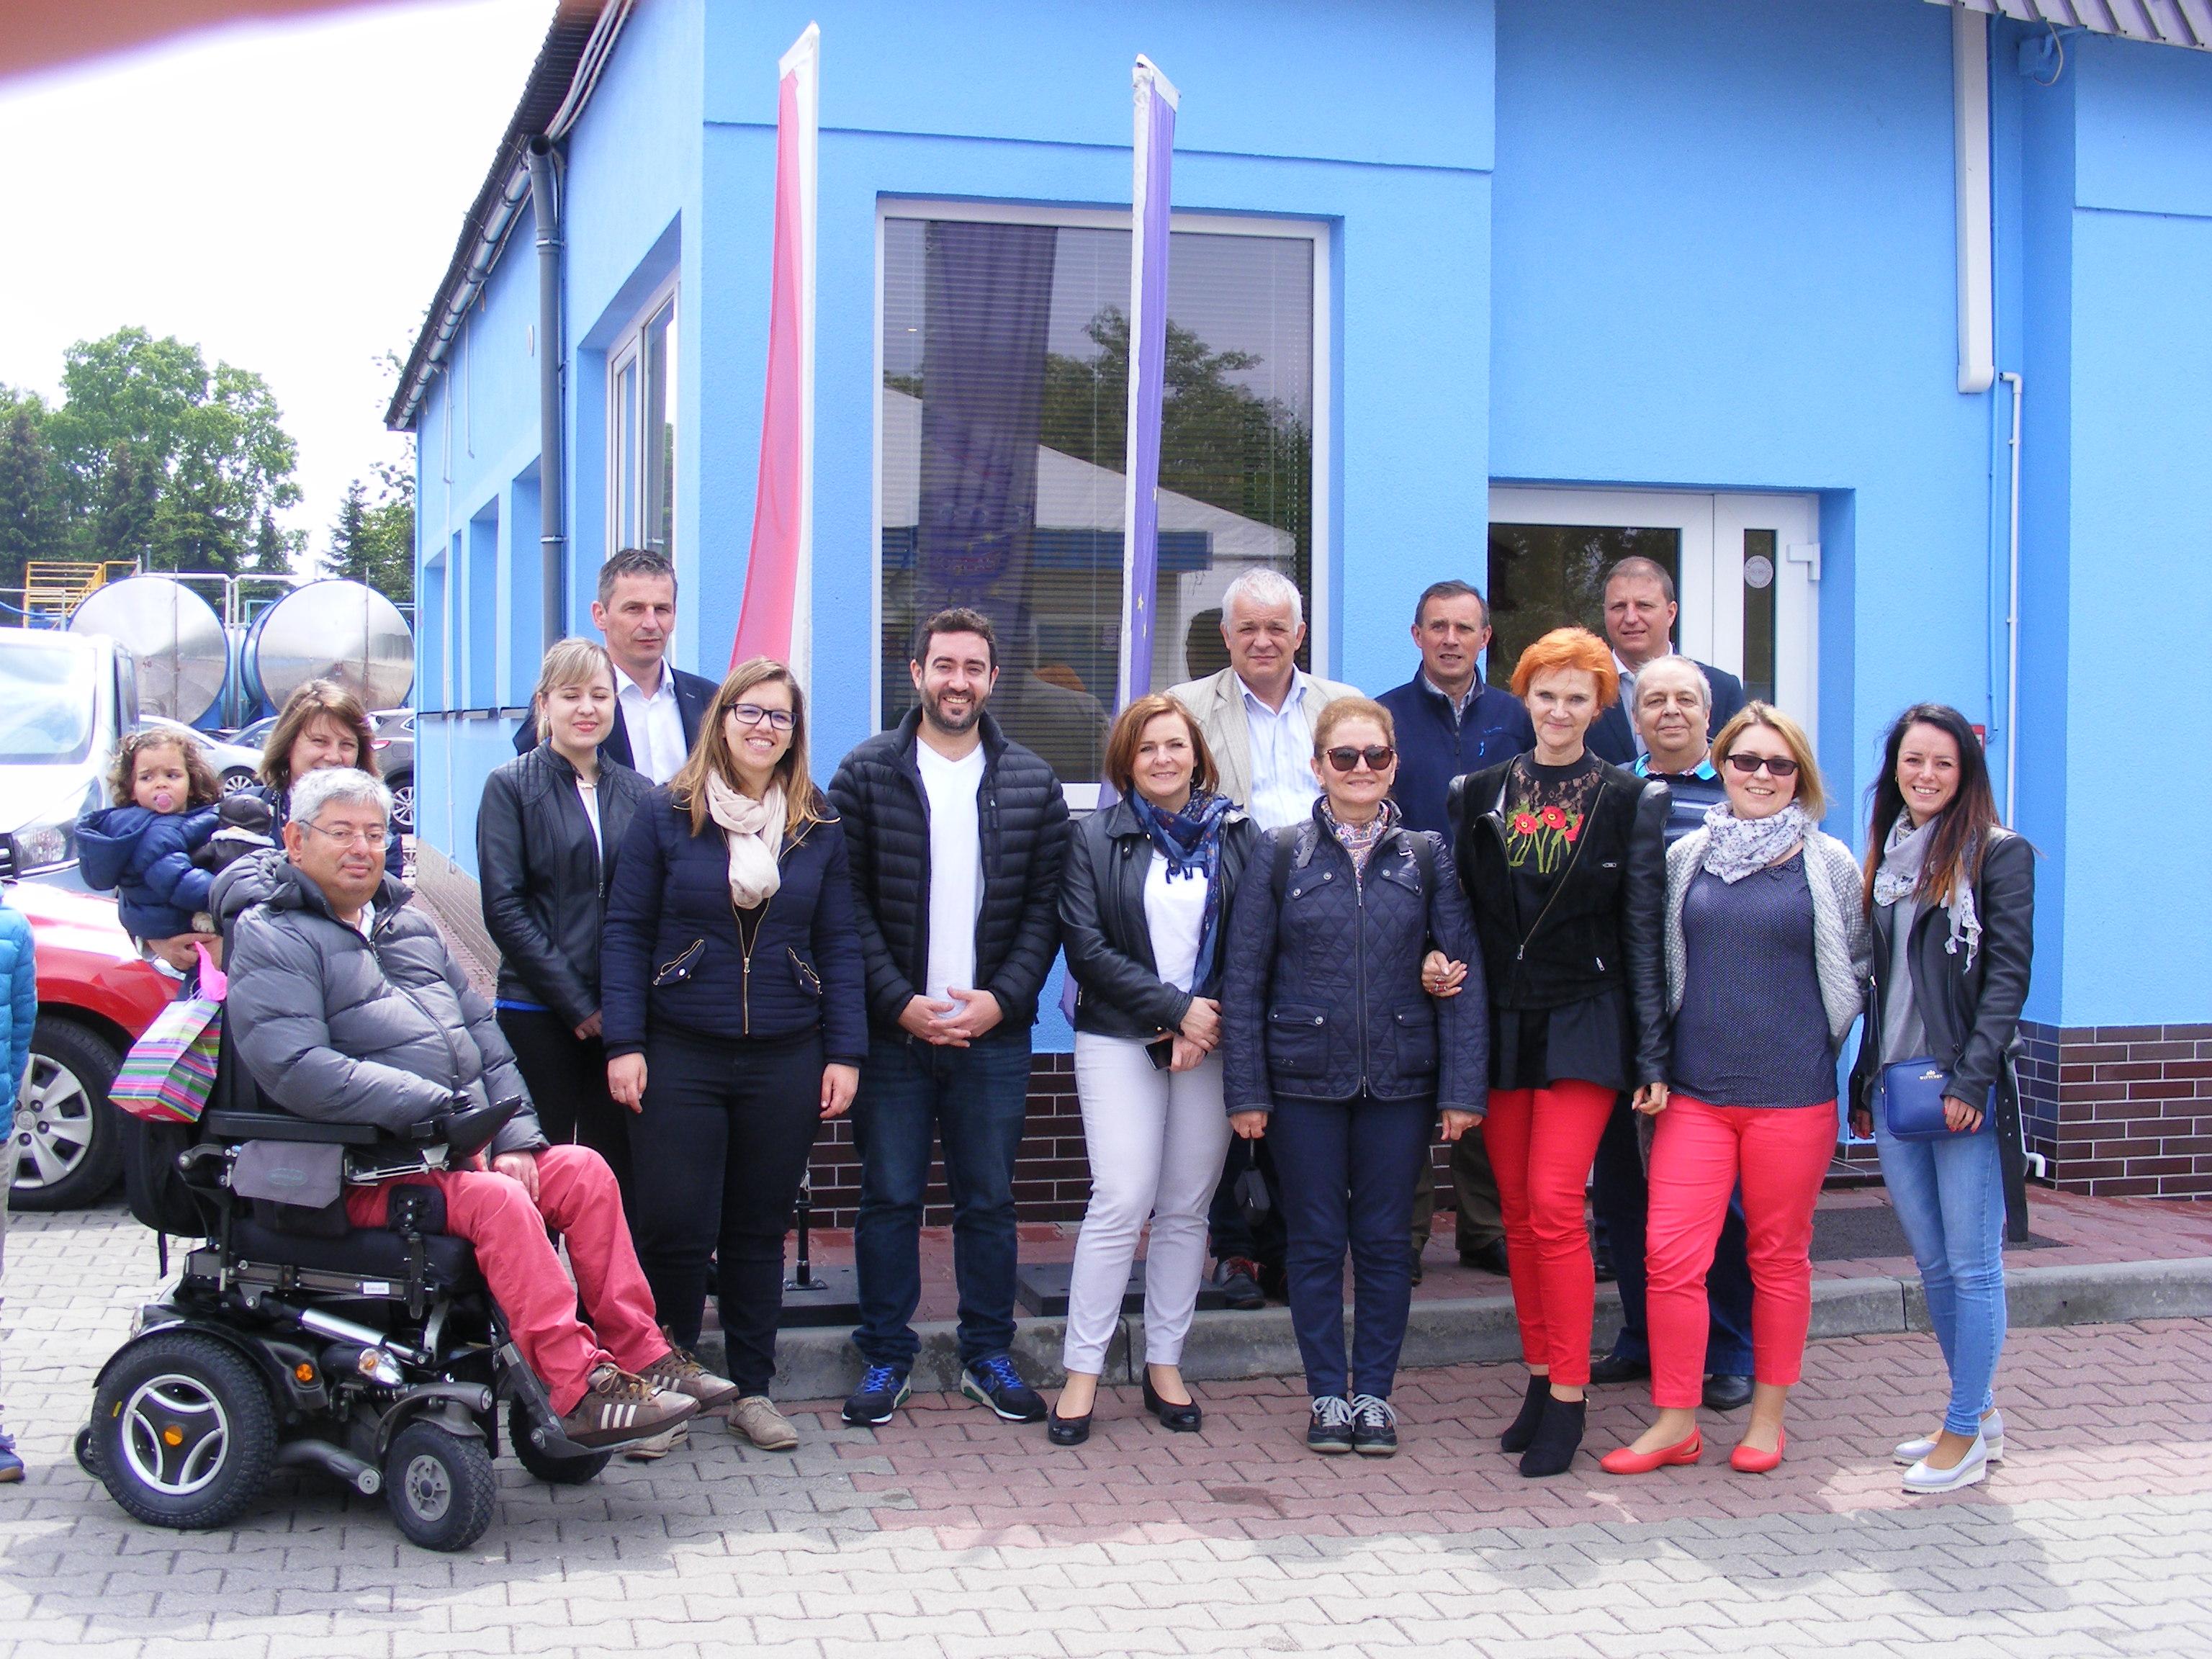 2017_Katowice_visit to partner ADW_25 May